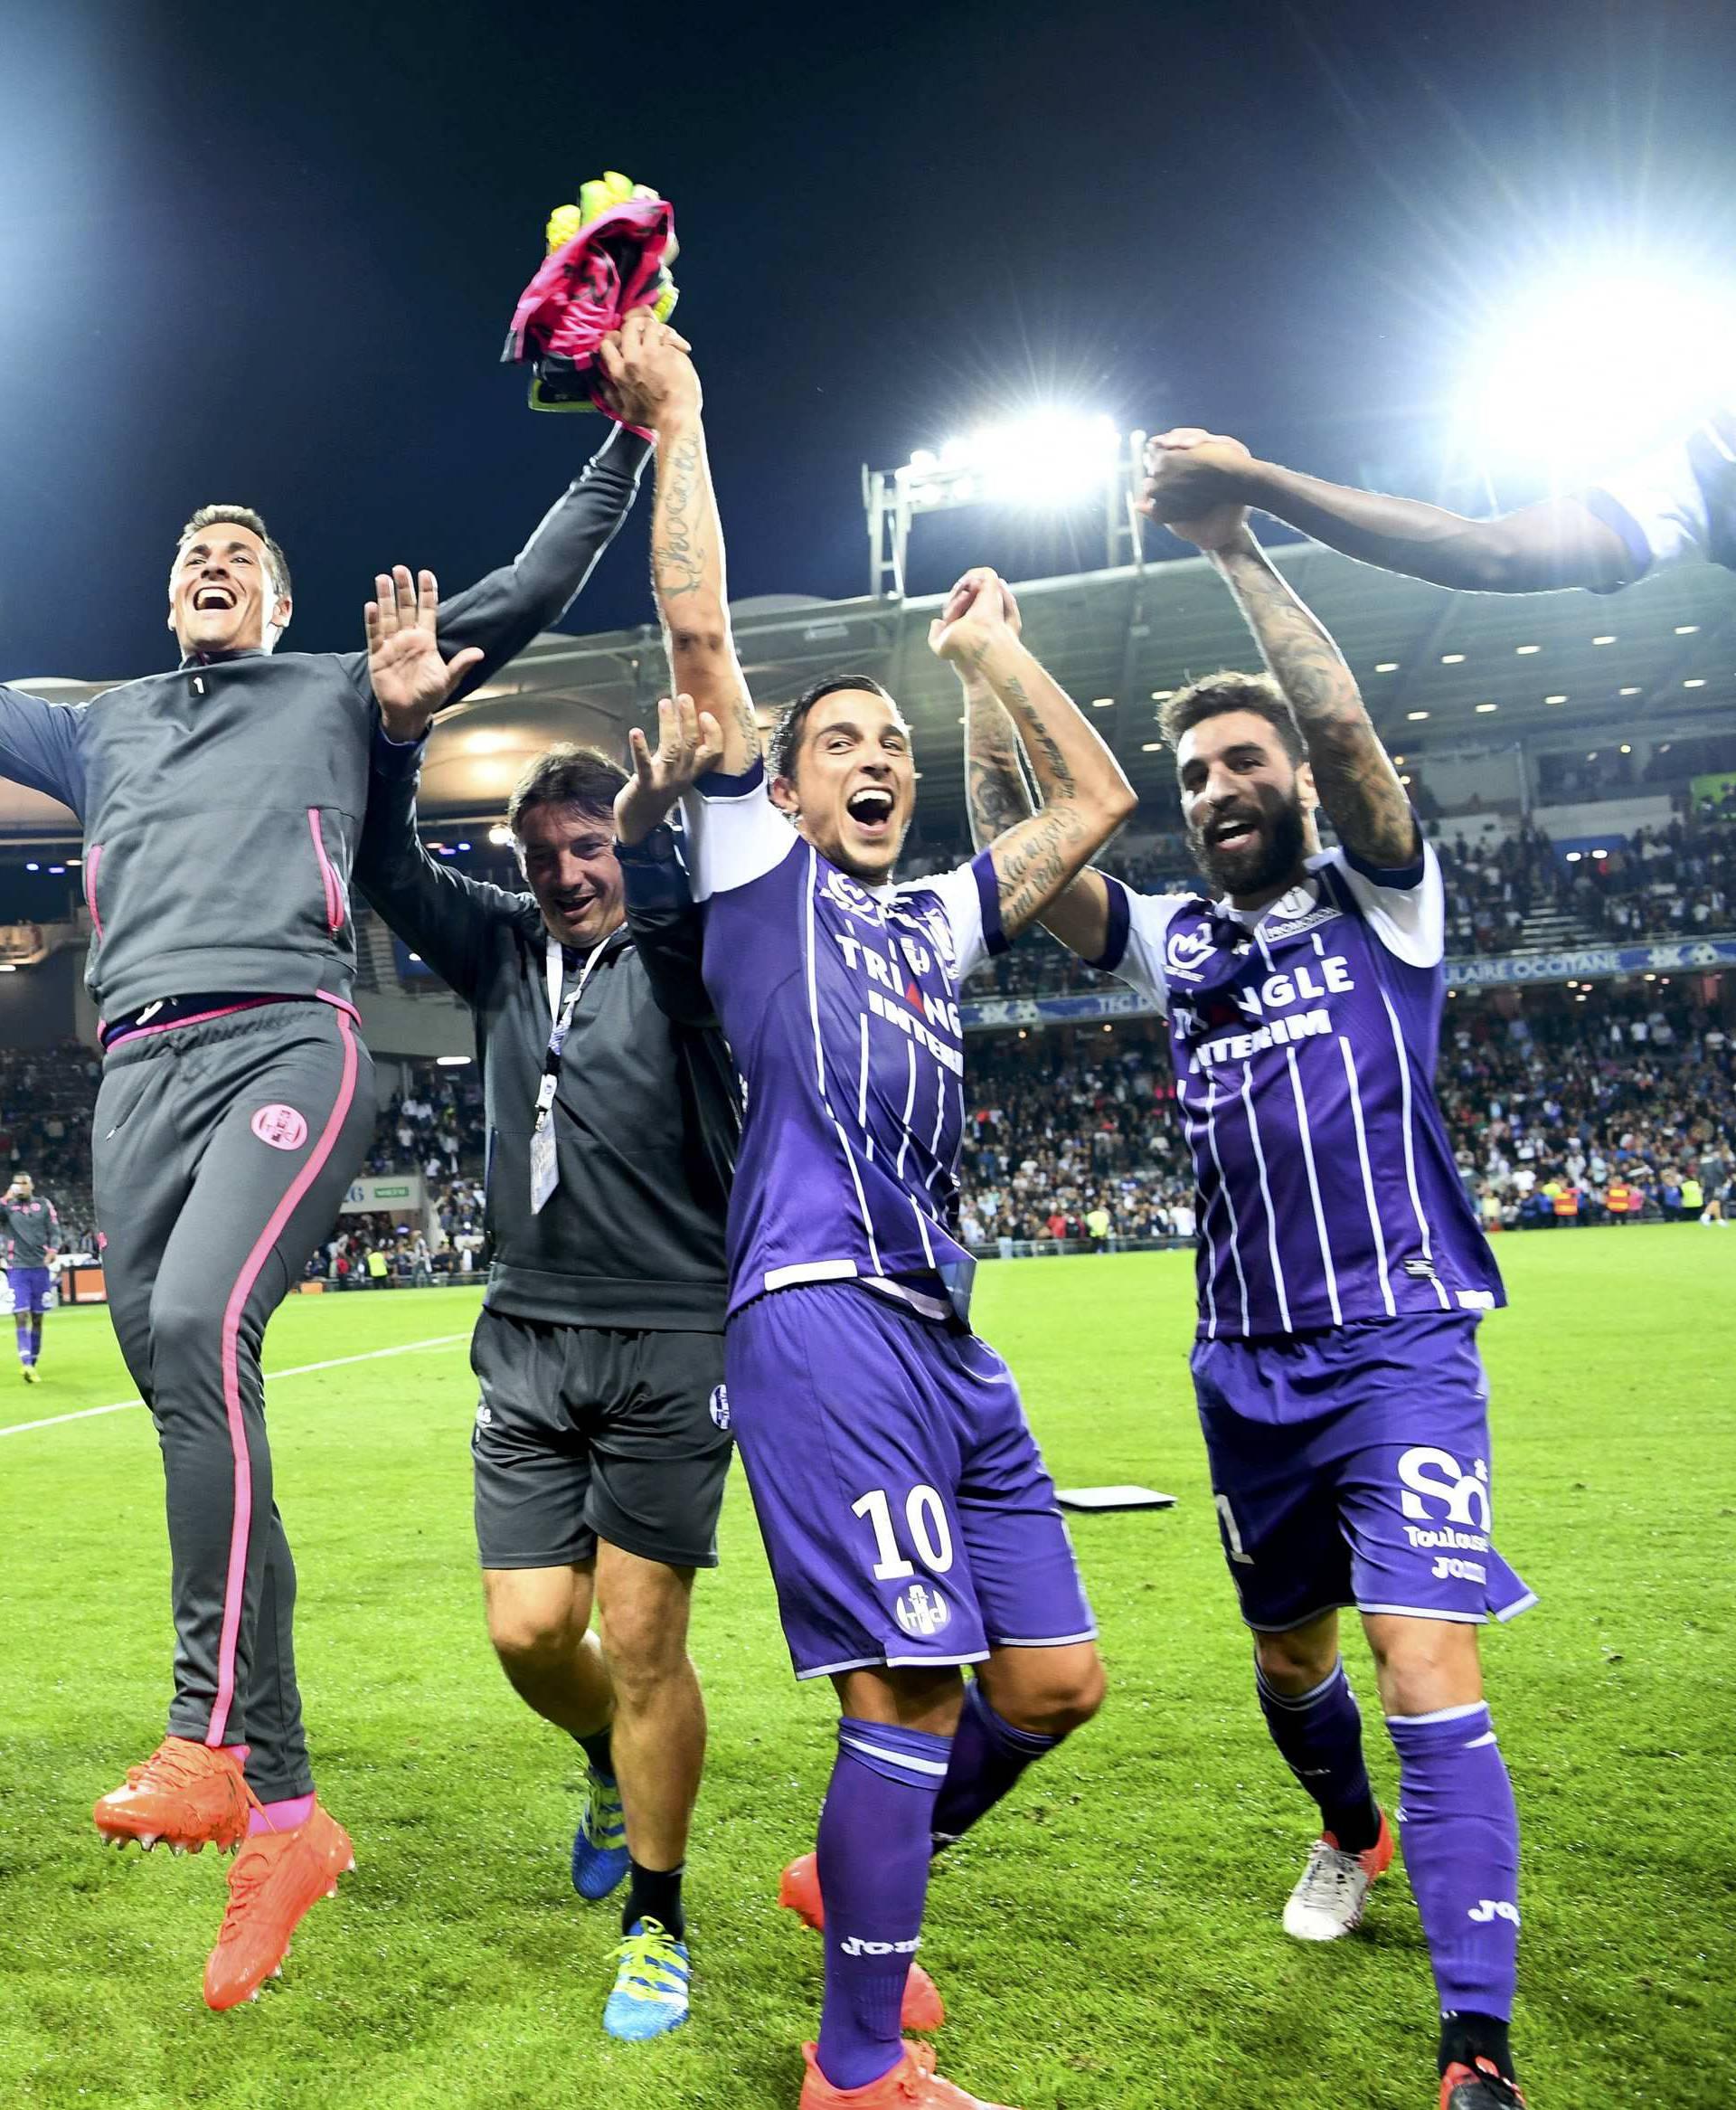 Football Soccer - Toulouse v Paris St Germain - French Ligue 1 - Stadium de Toulouse, France